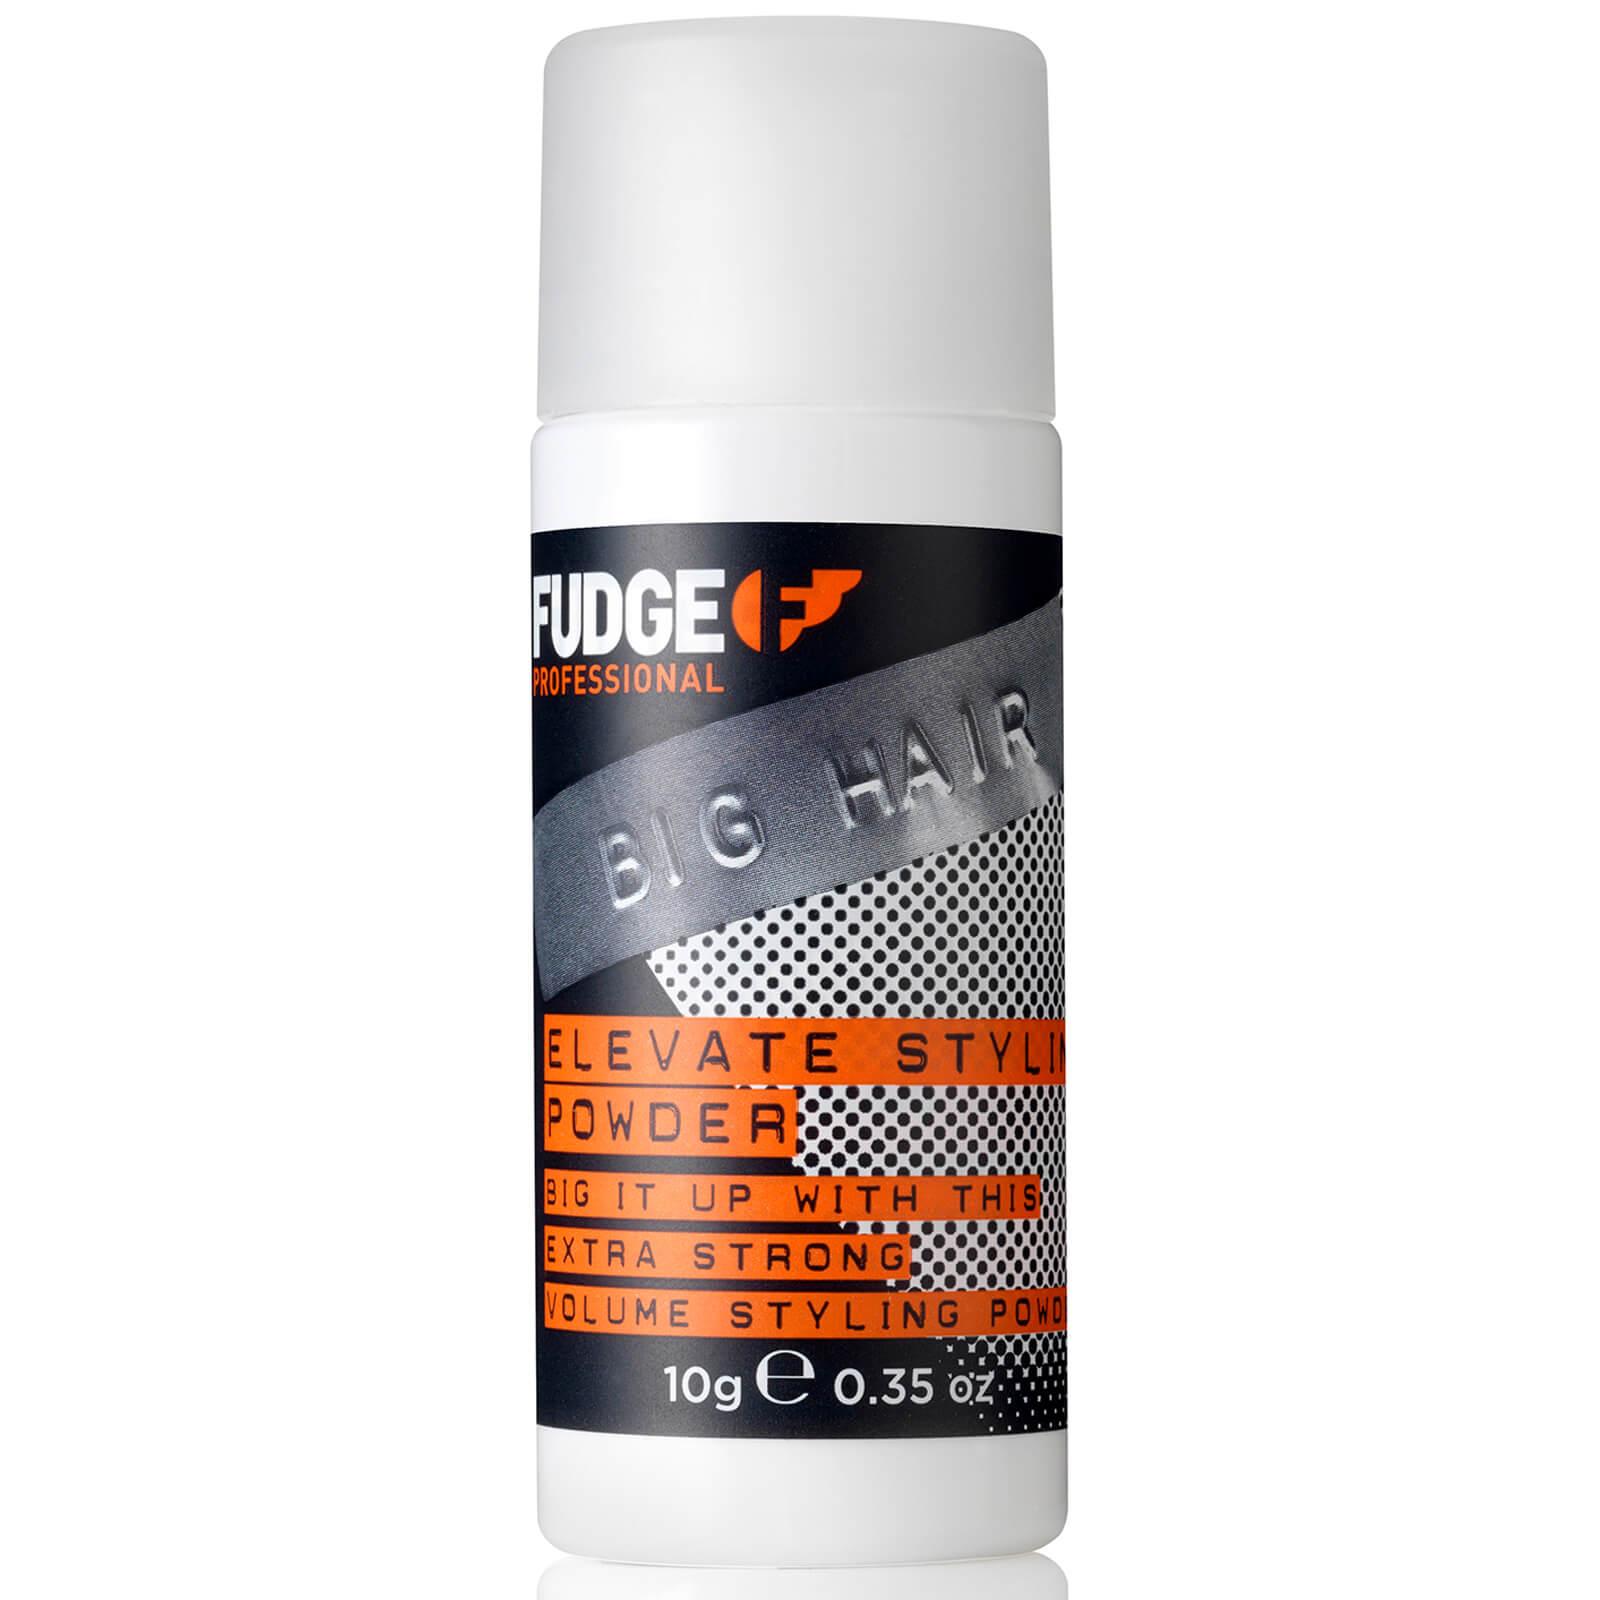 Fudge Professional Poudre Coiffante Big Hair Elevate de Fudge (10g)